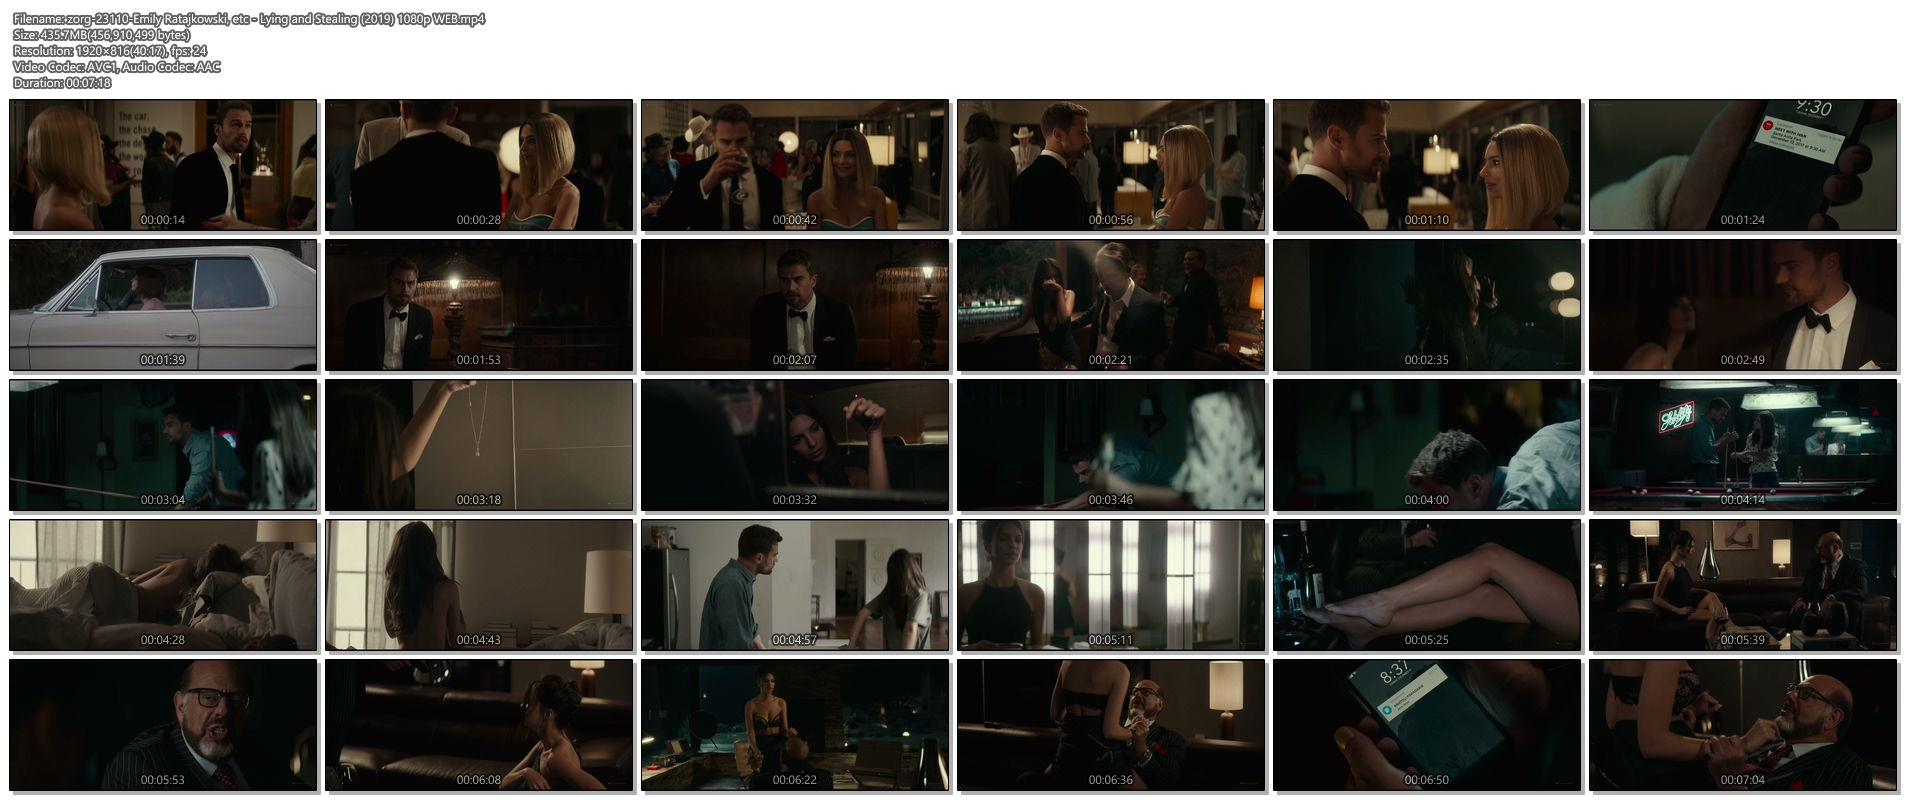 Emily Ratajkowski hot sideboob - Lying and Stealing (2019) 1080p WEB (1)